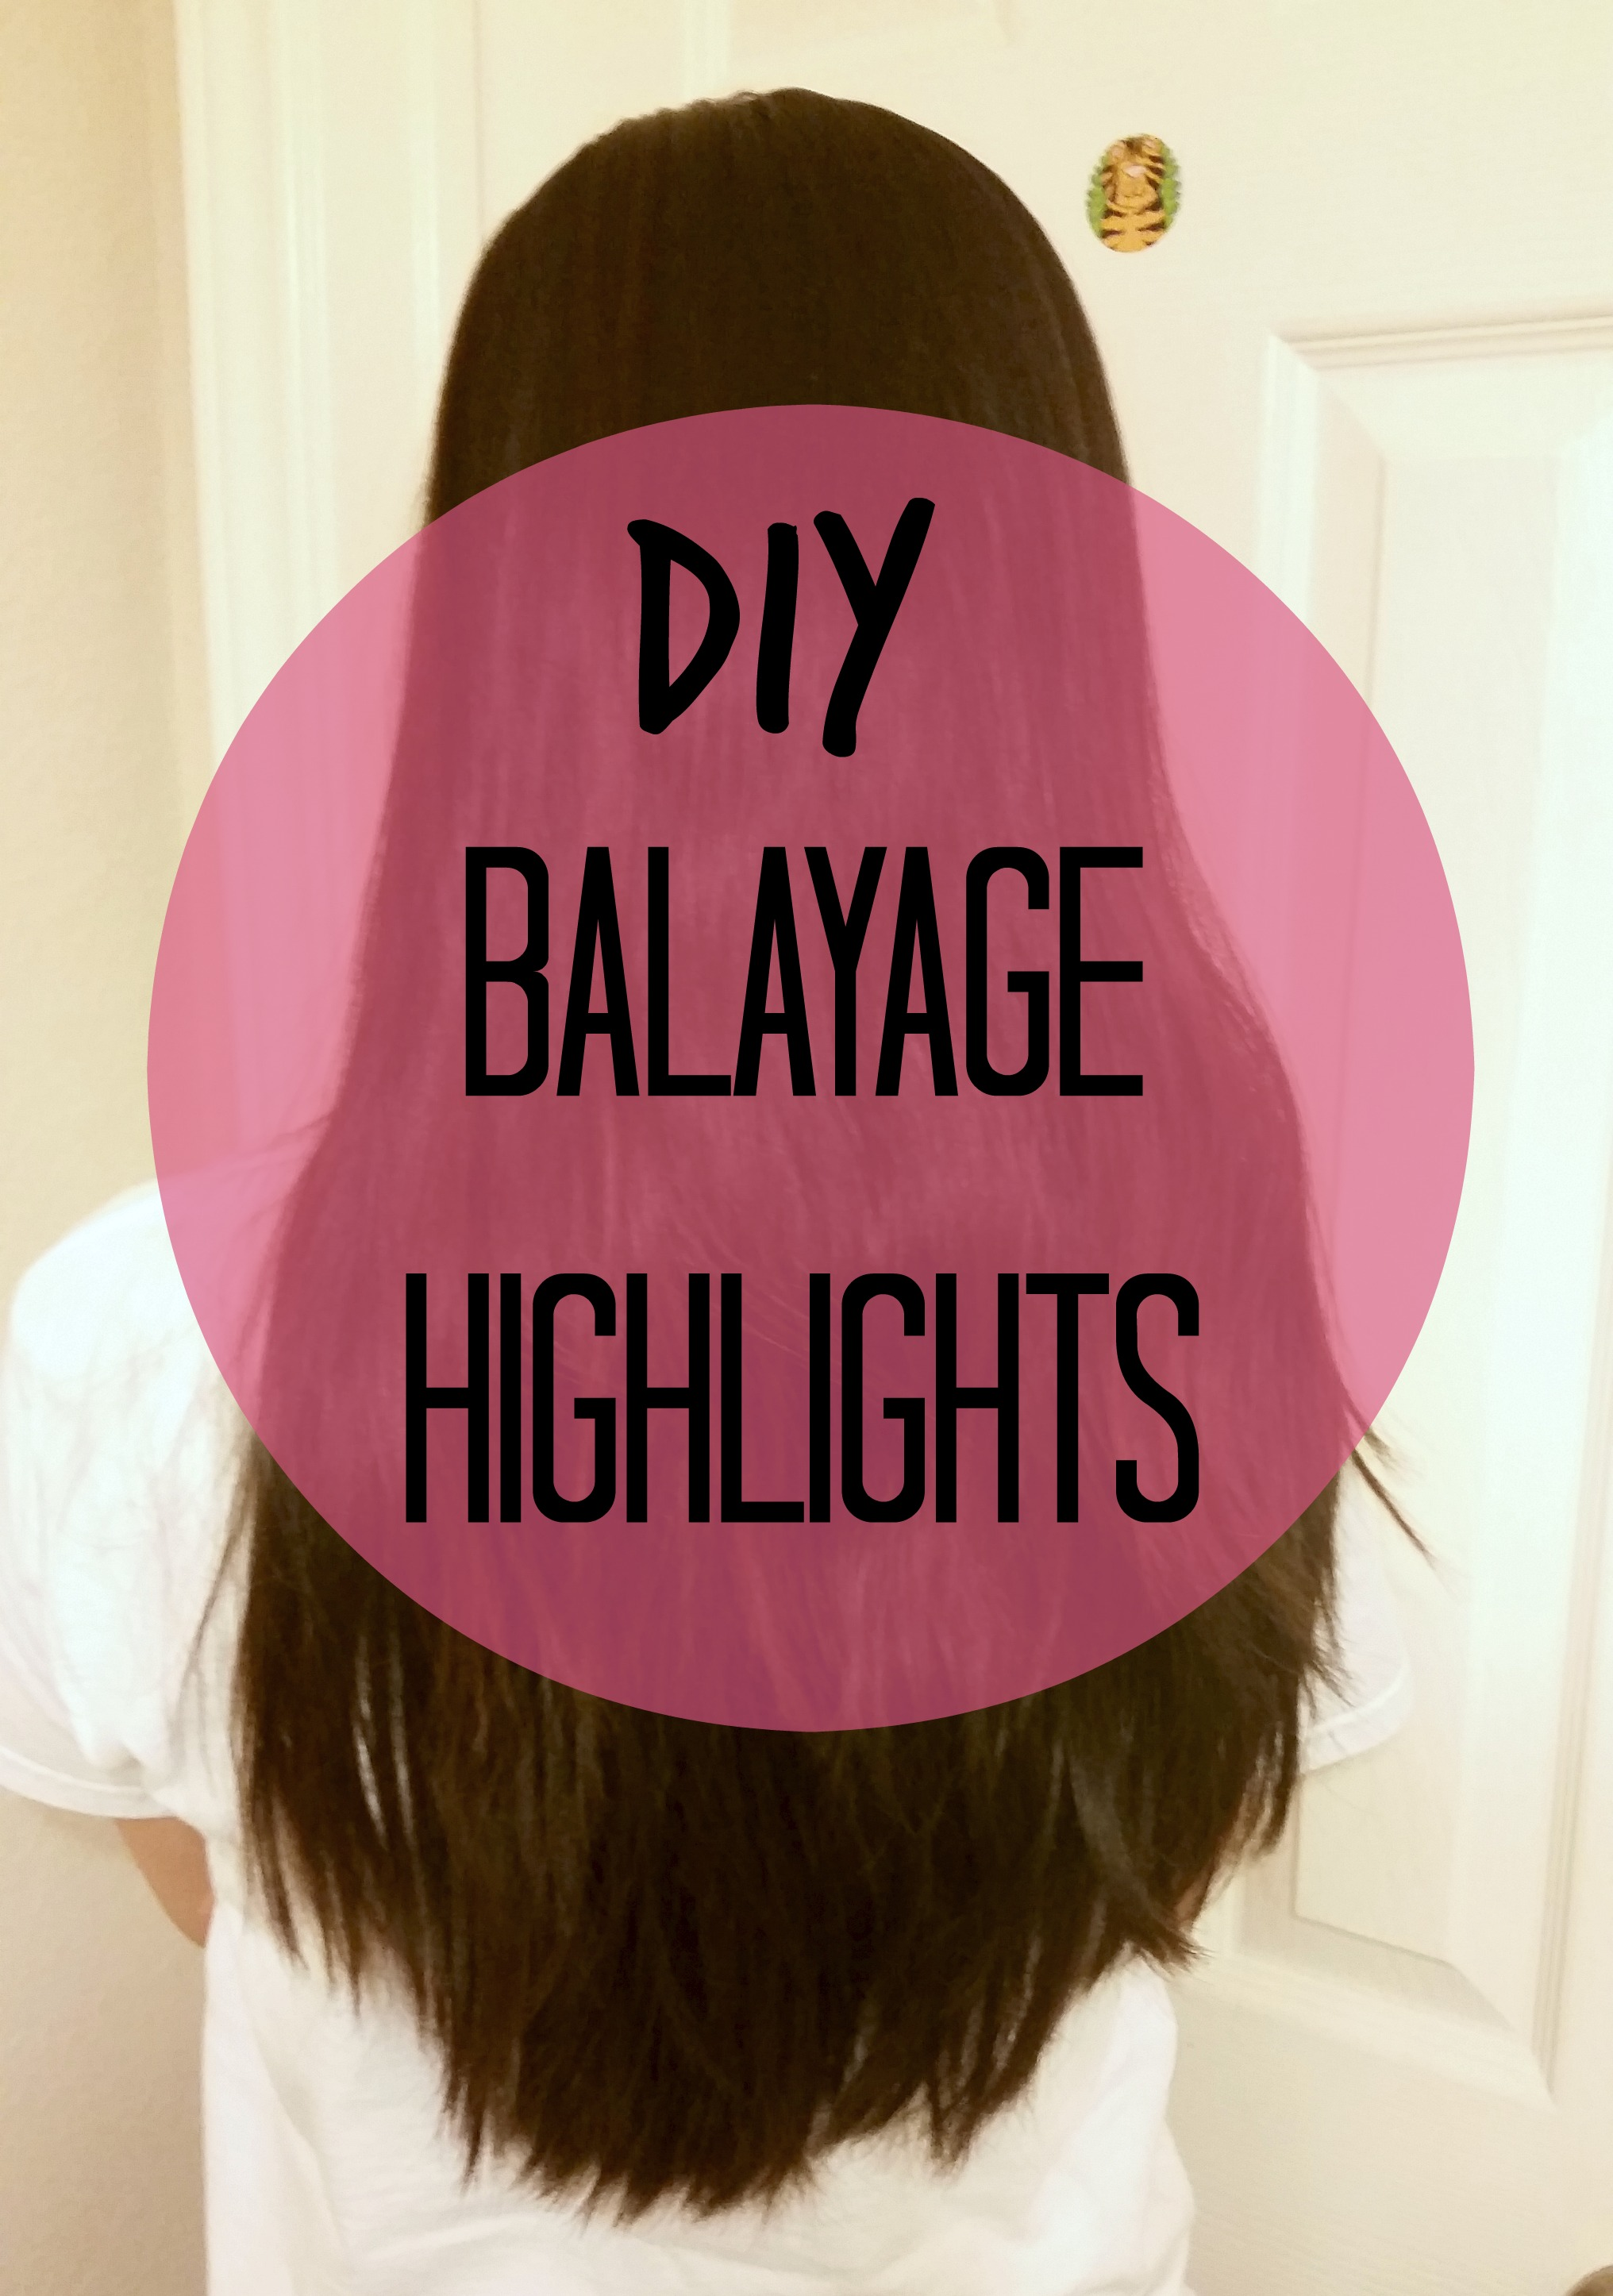 Diy balayage highlights juleps tea diy balayage highlights solutioingenieria Image collections